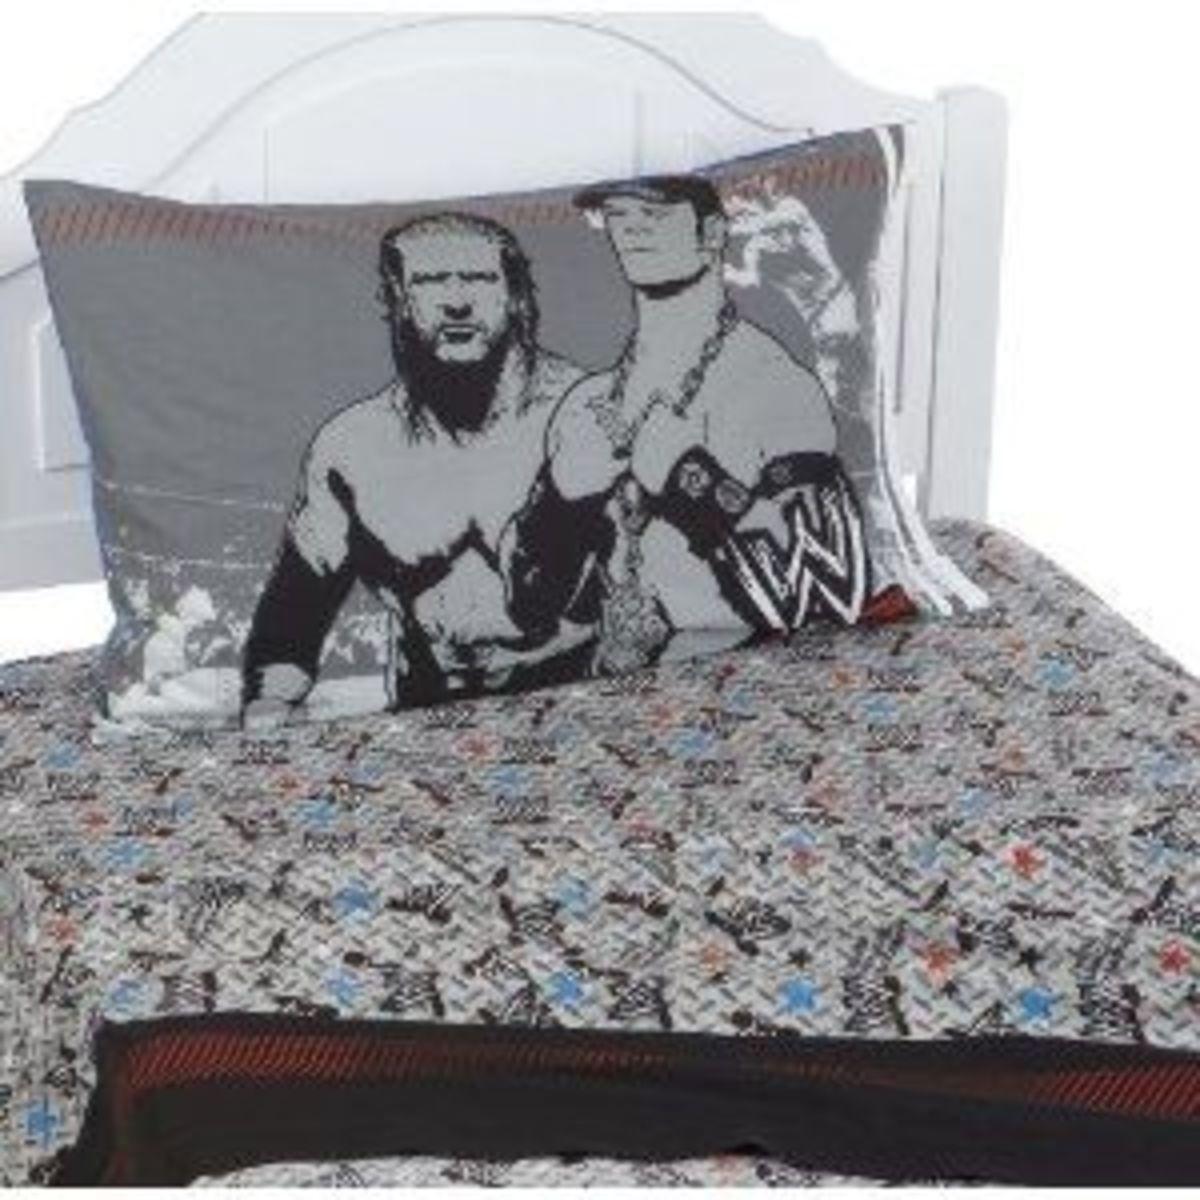 WWE Ringside Sheet Set